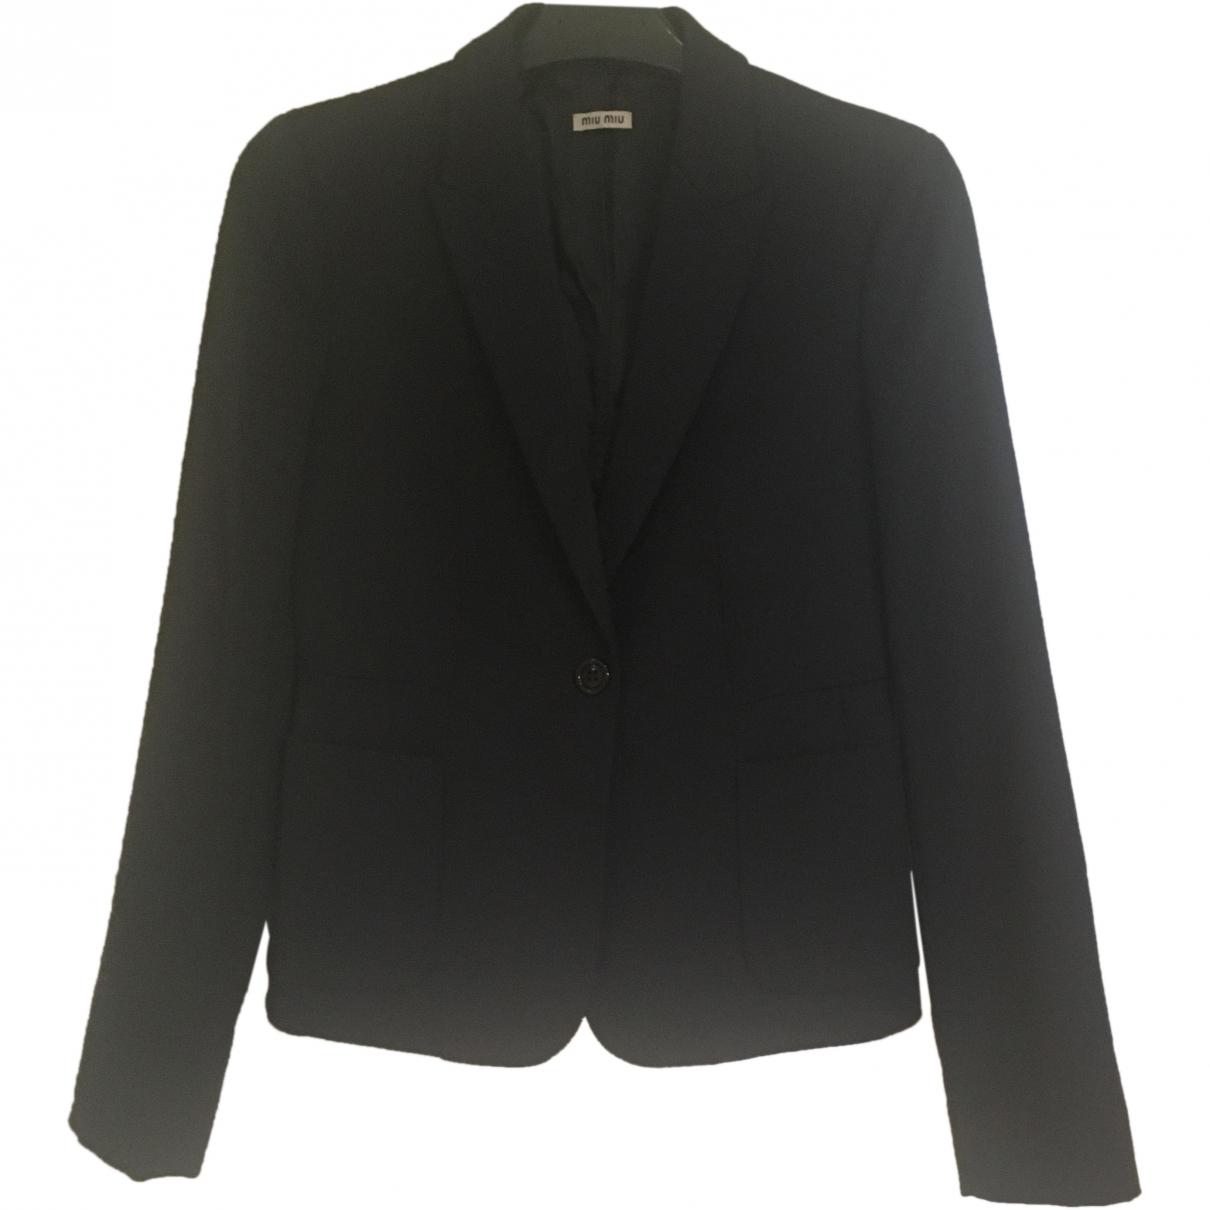 Miu Miu \N Navy Wool jacket for Women 38 IT